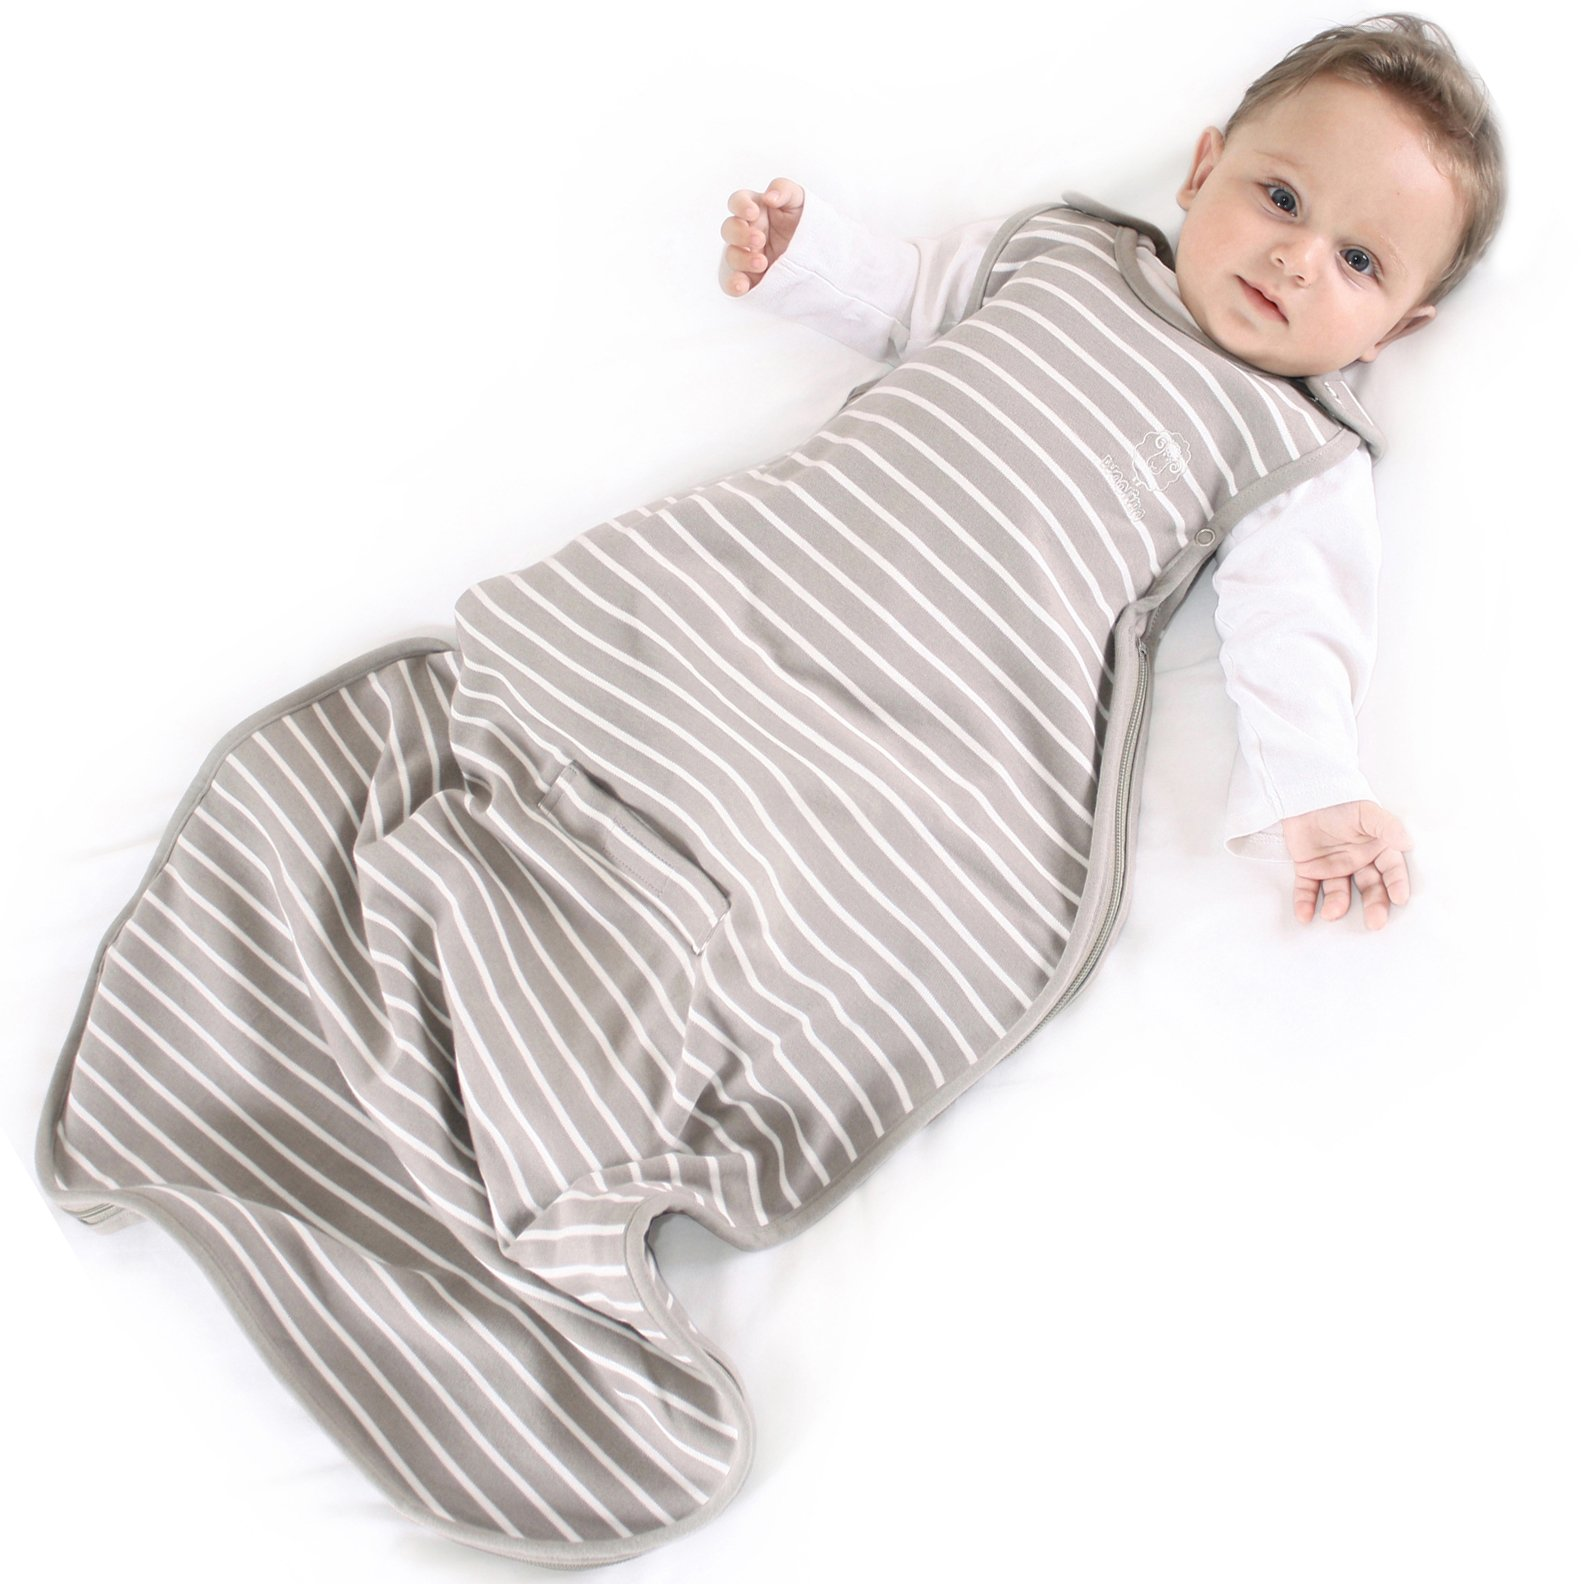 Woolino Baby Sleep Sack Bag from, 4 Season, Merino Wool, 2 Months to 2 Year, Earth